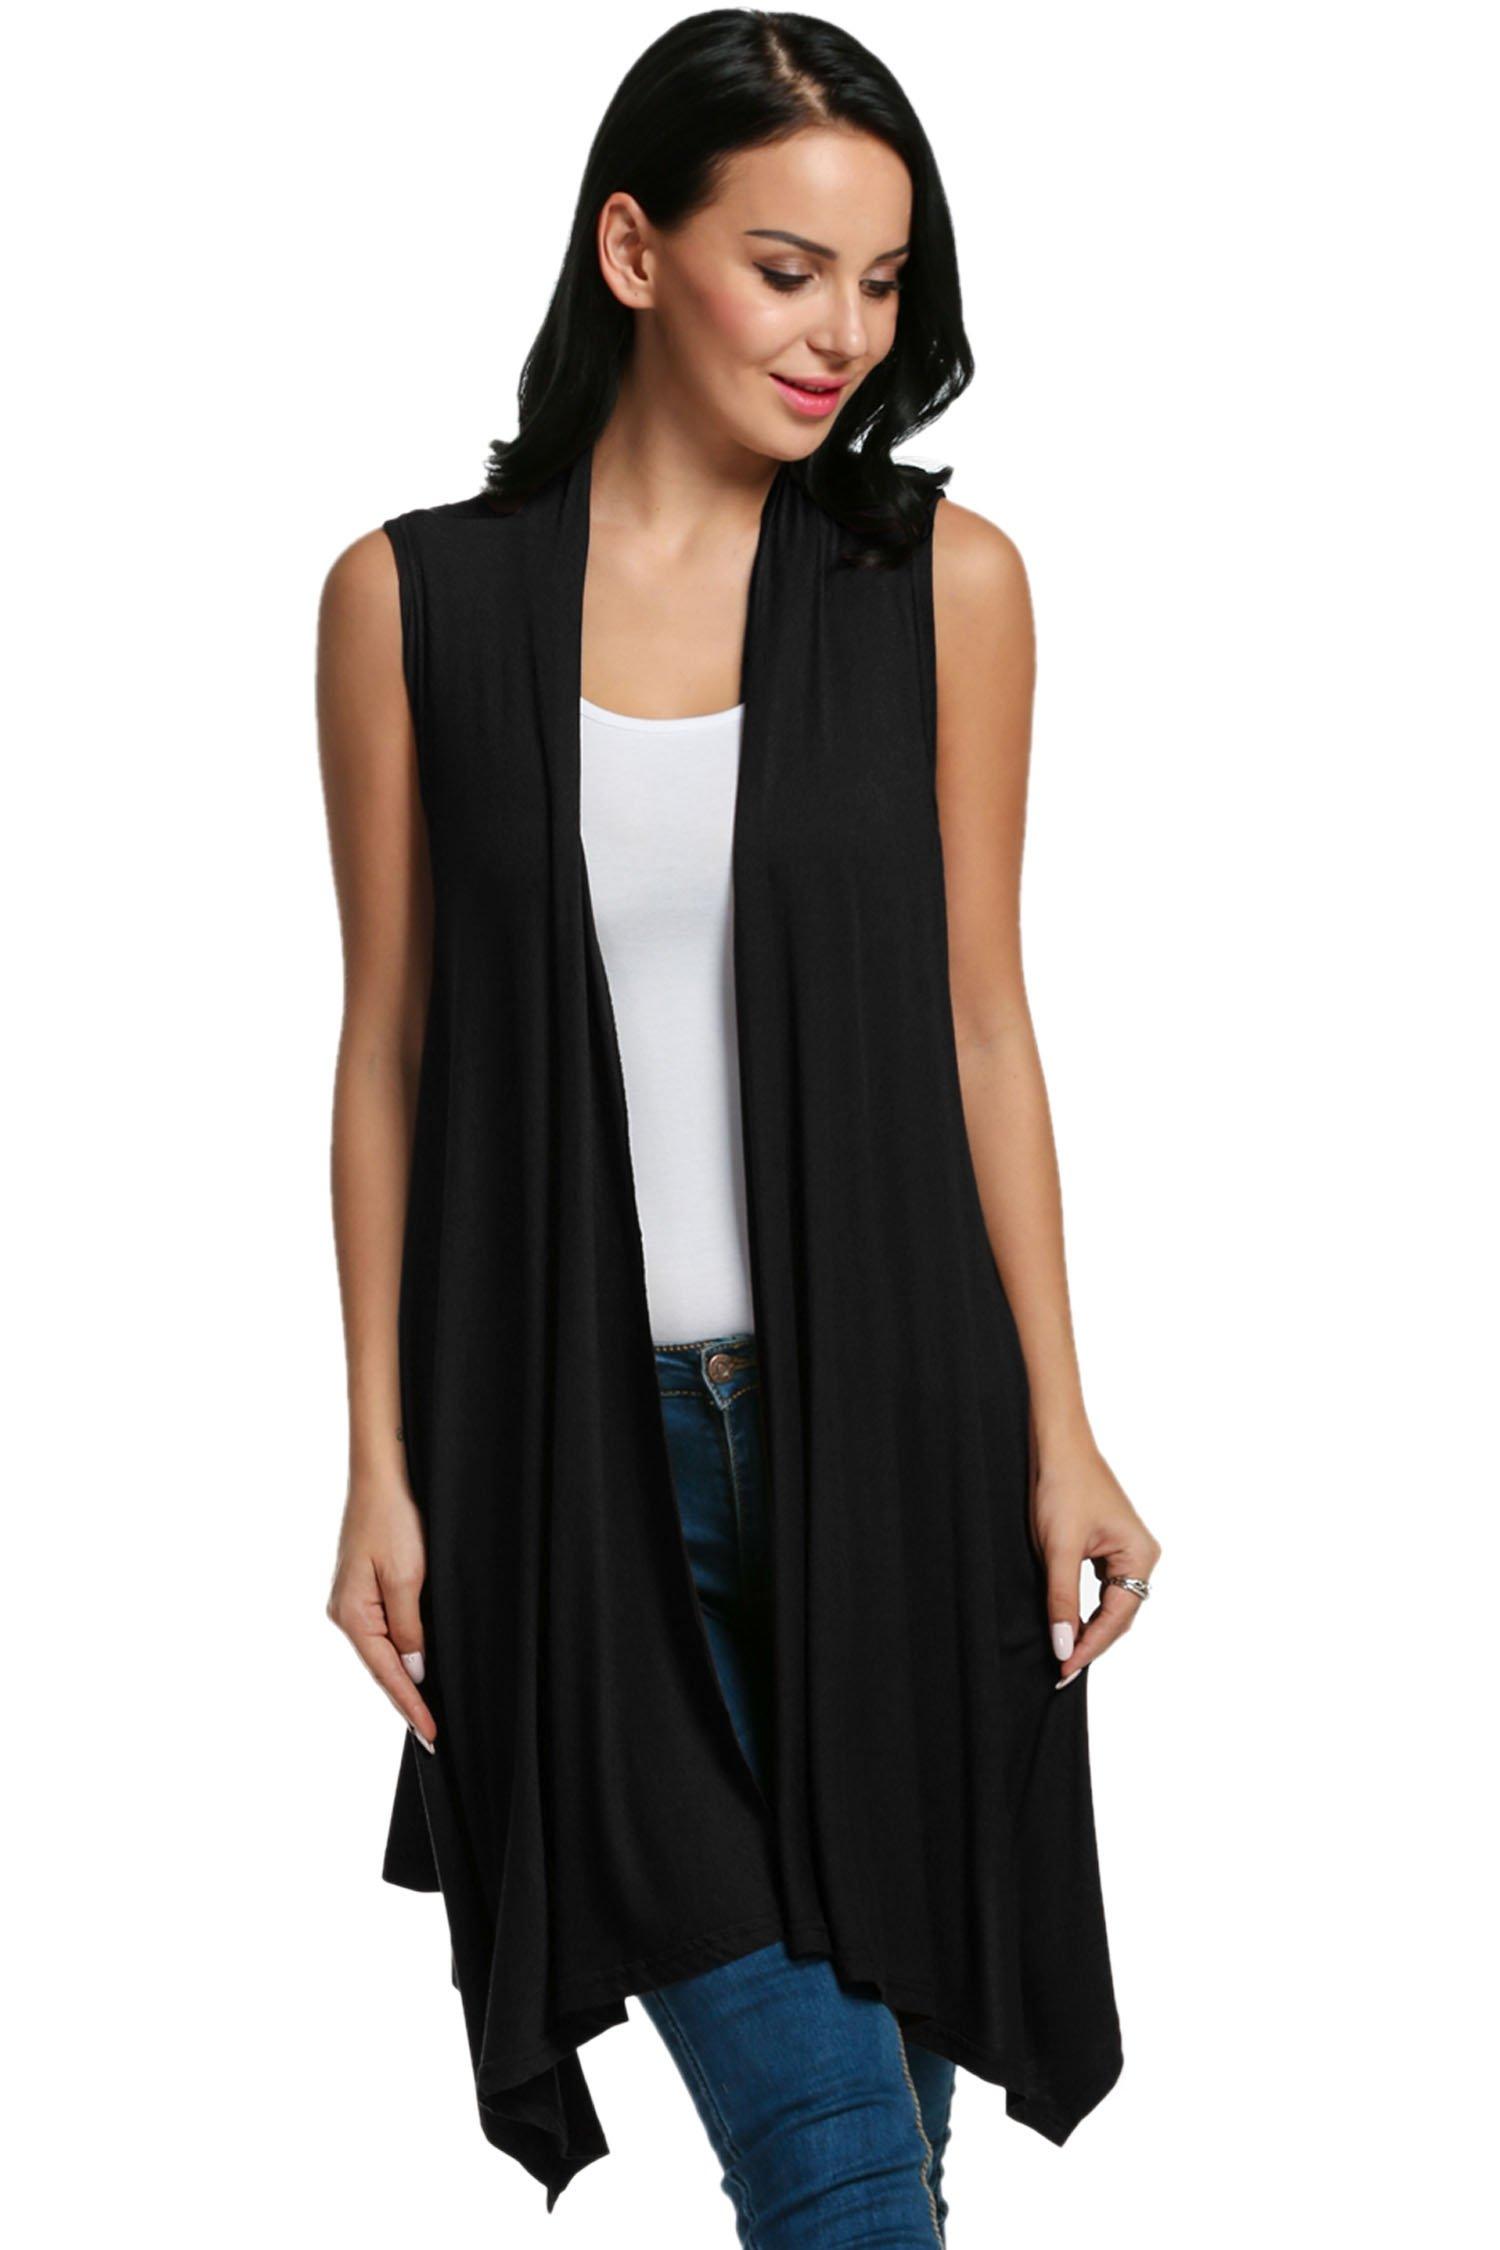 Beyove Women's Asymetric Hem Sleeveless Open Front Drape Cardigan Sweater Vest Black M